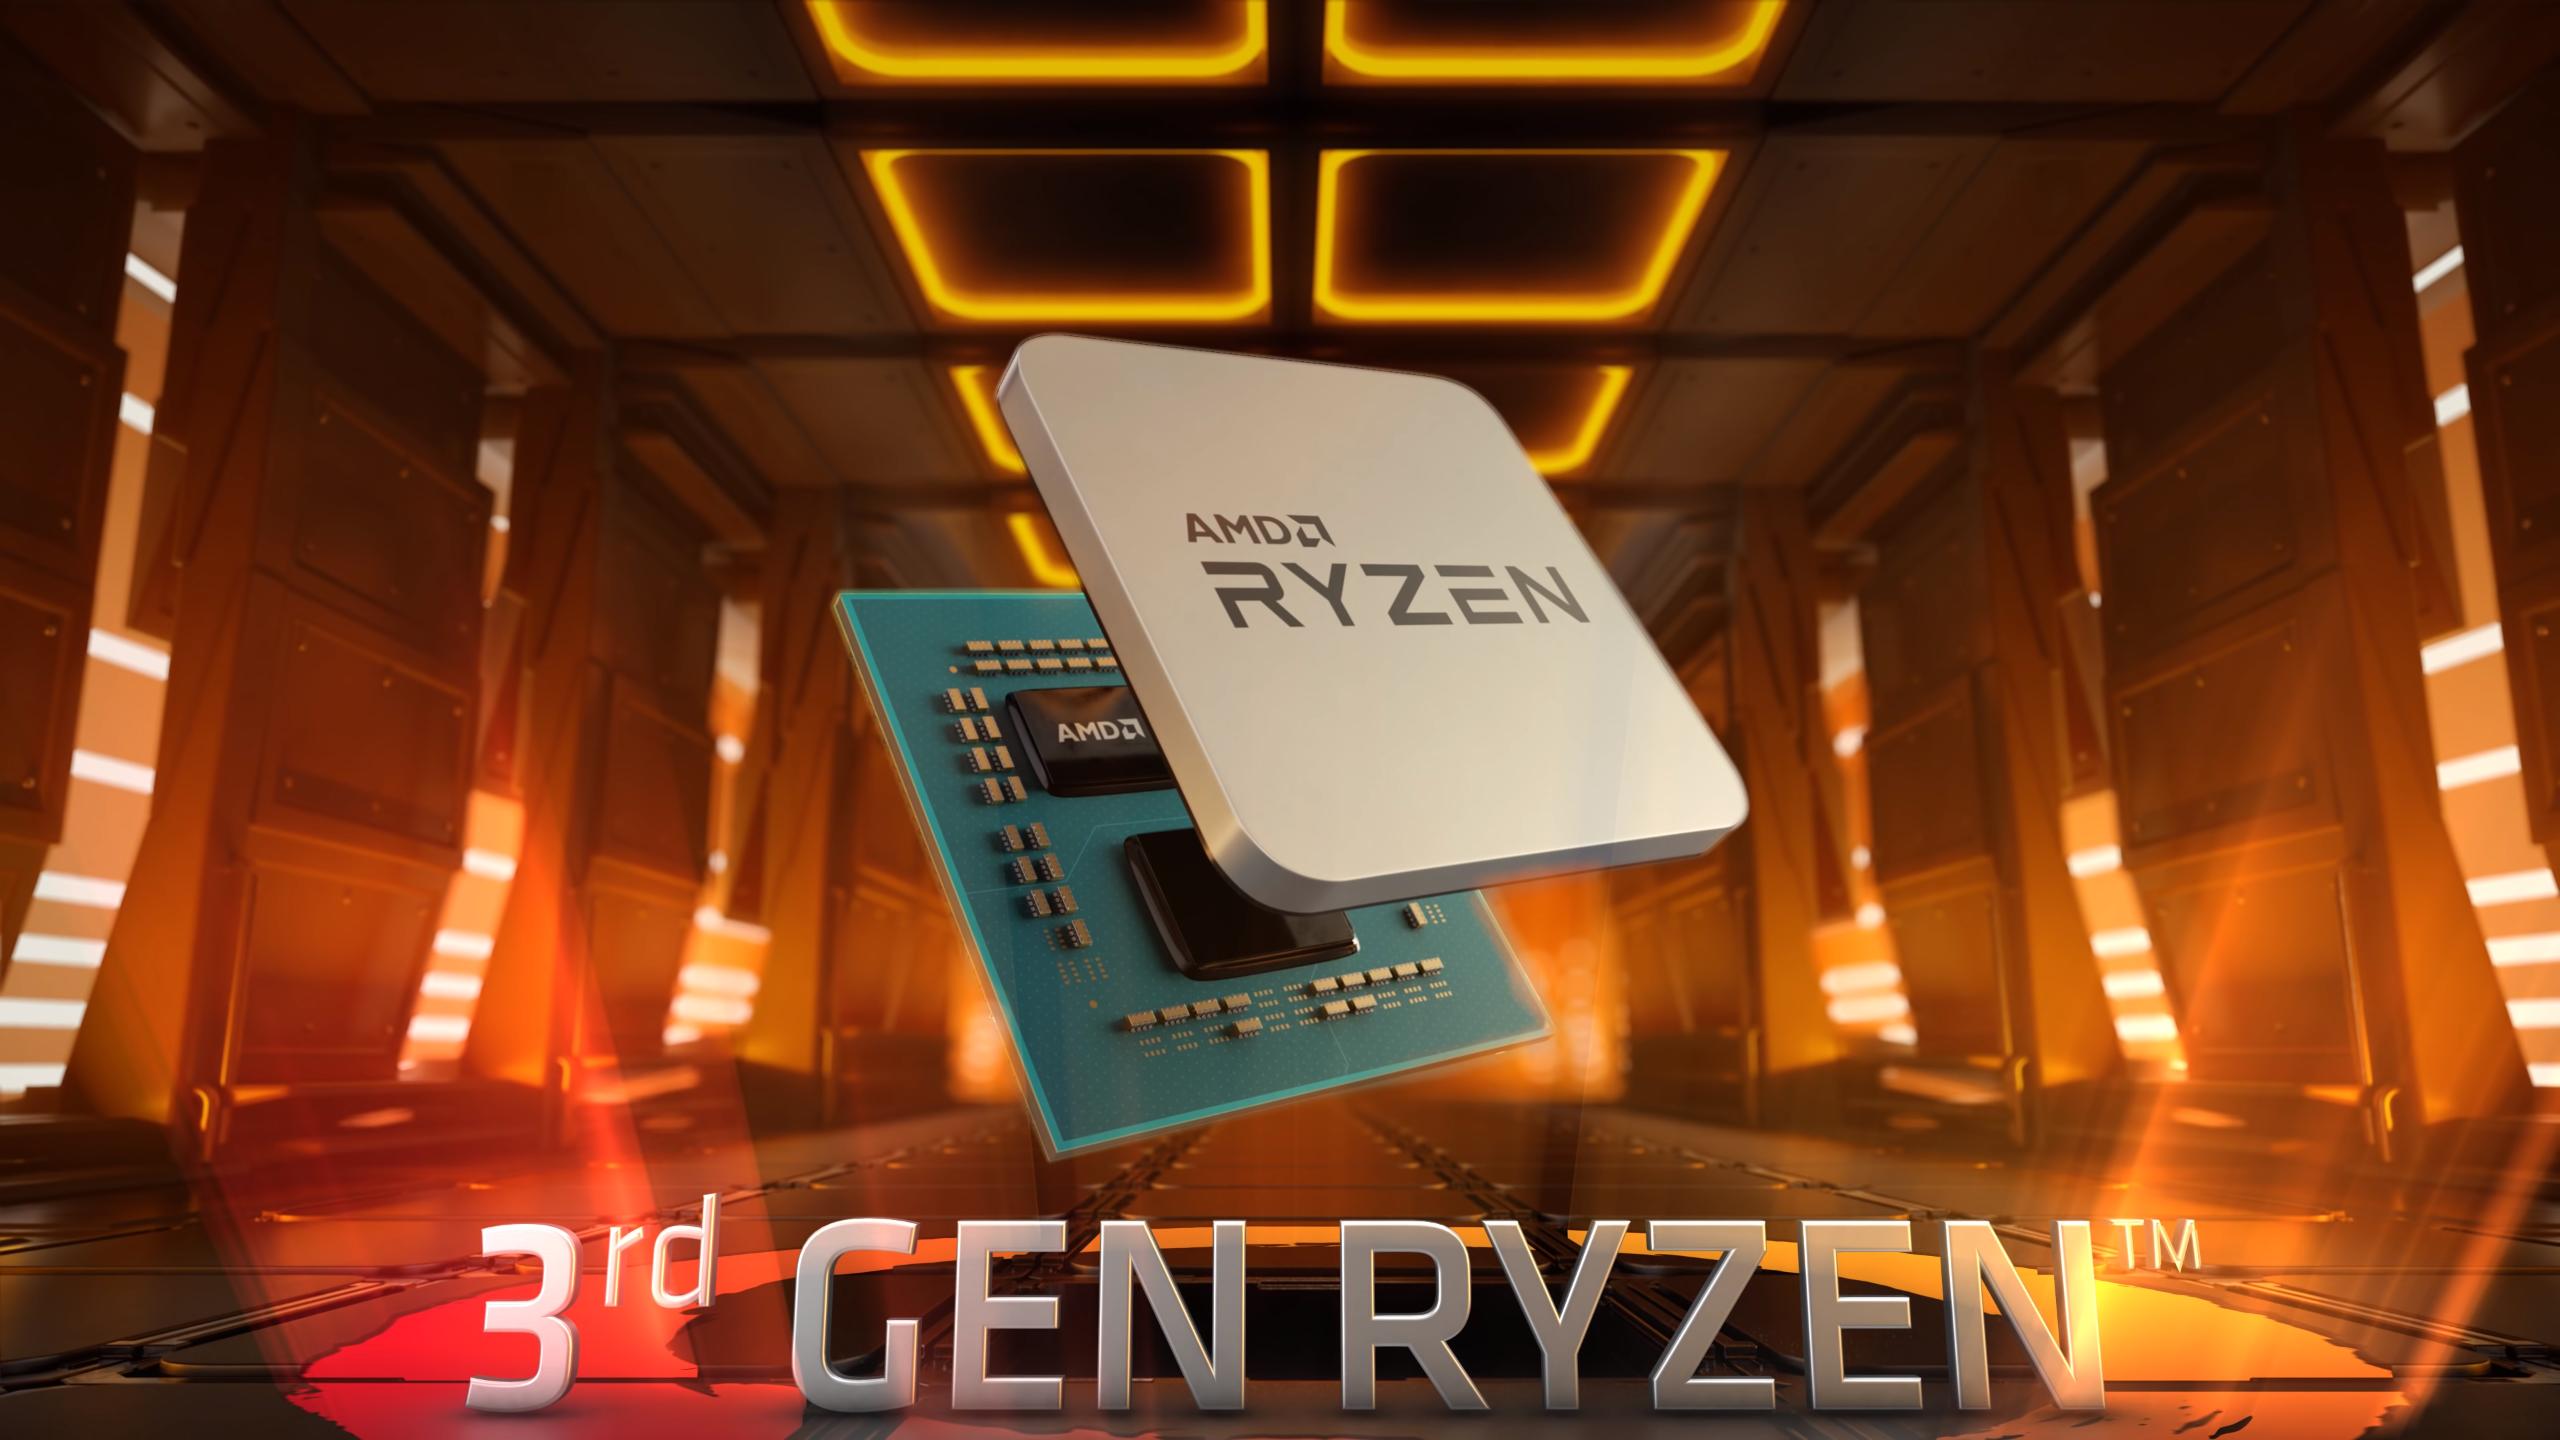 Amd Ryzen 9 3900x 12 Core Ryzen 7 3700x 8 Core Cpu Review Leak